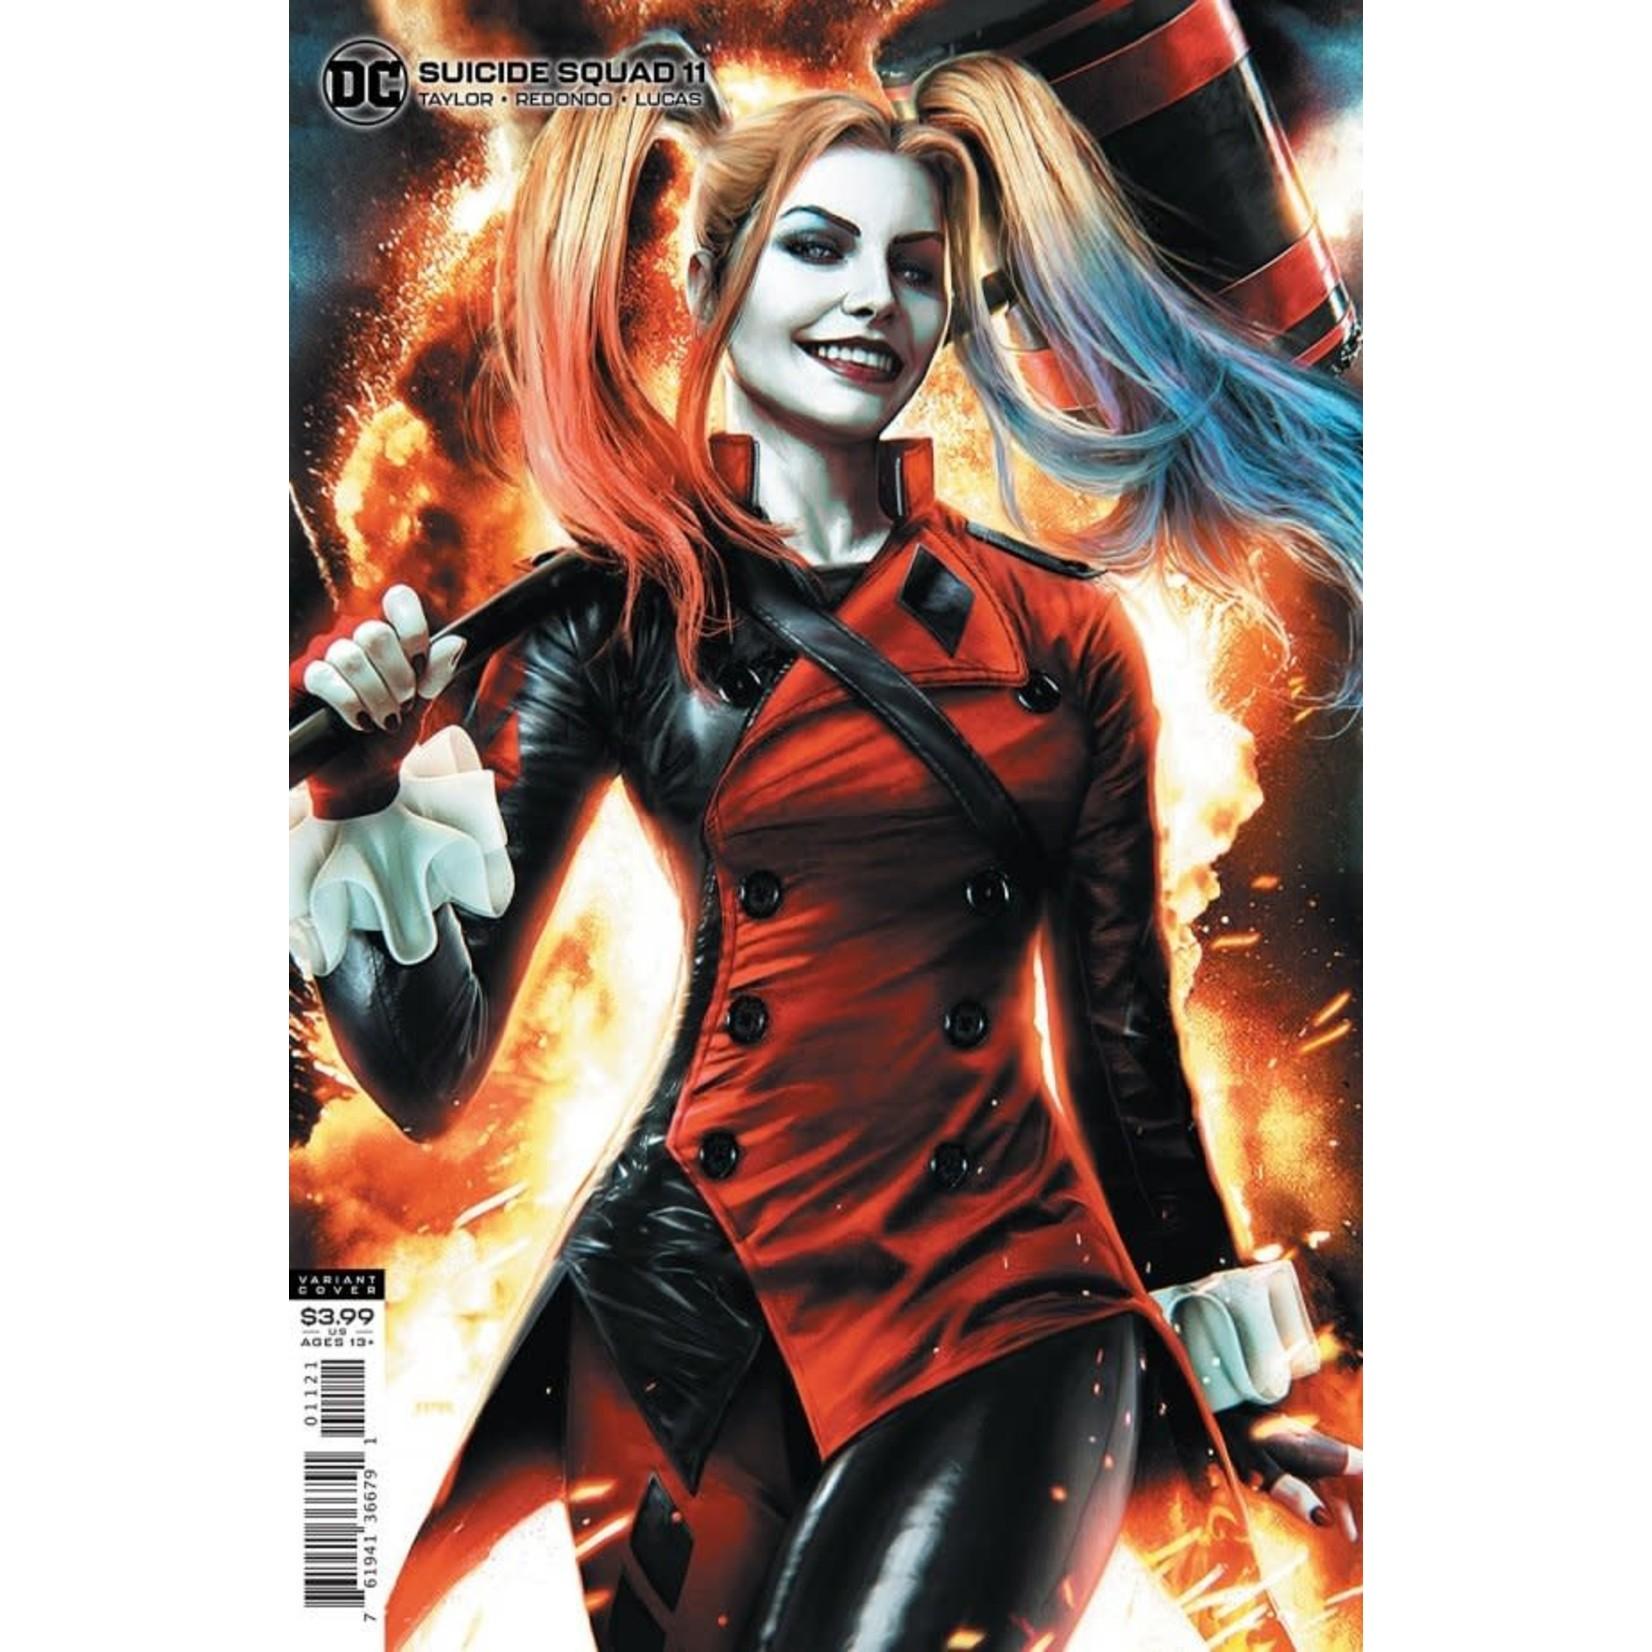 DC Comics Suicide Squad #11 Variant Edition